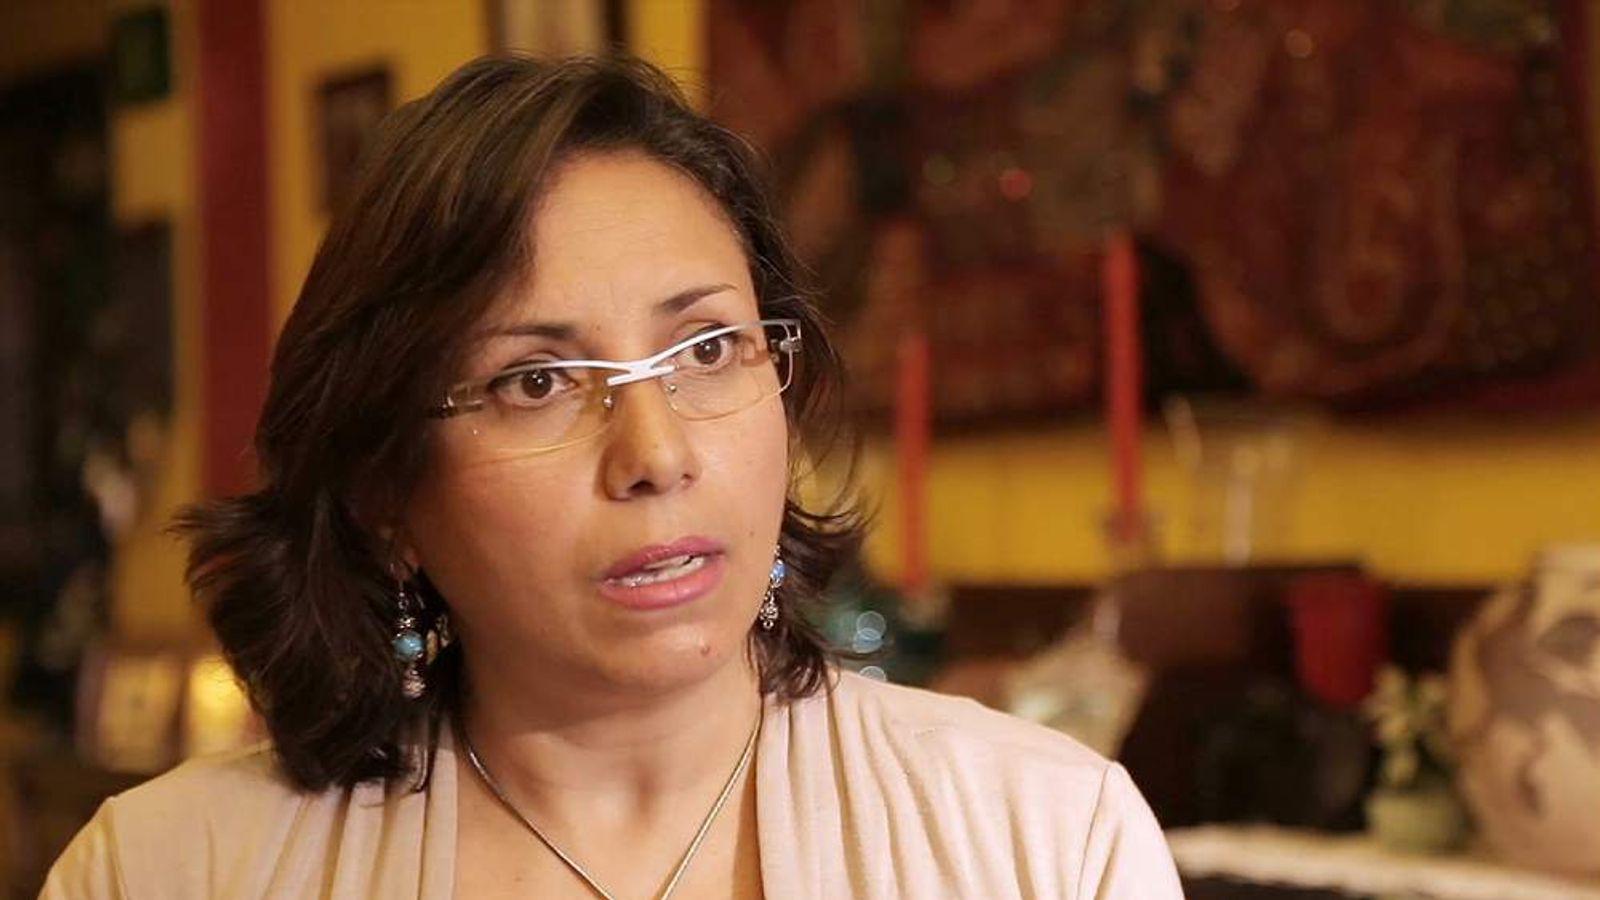 Egypt rape victim Hania Moheeb